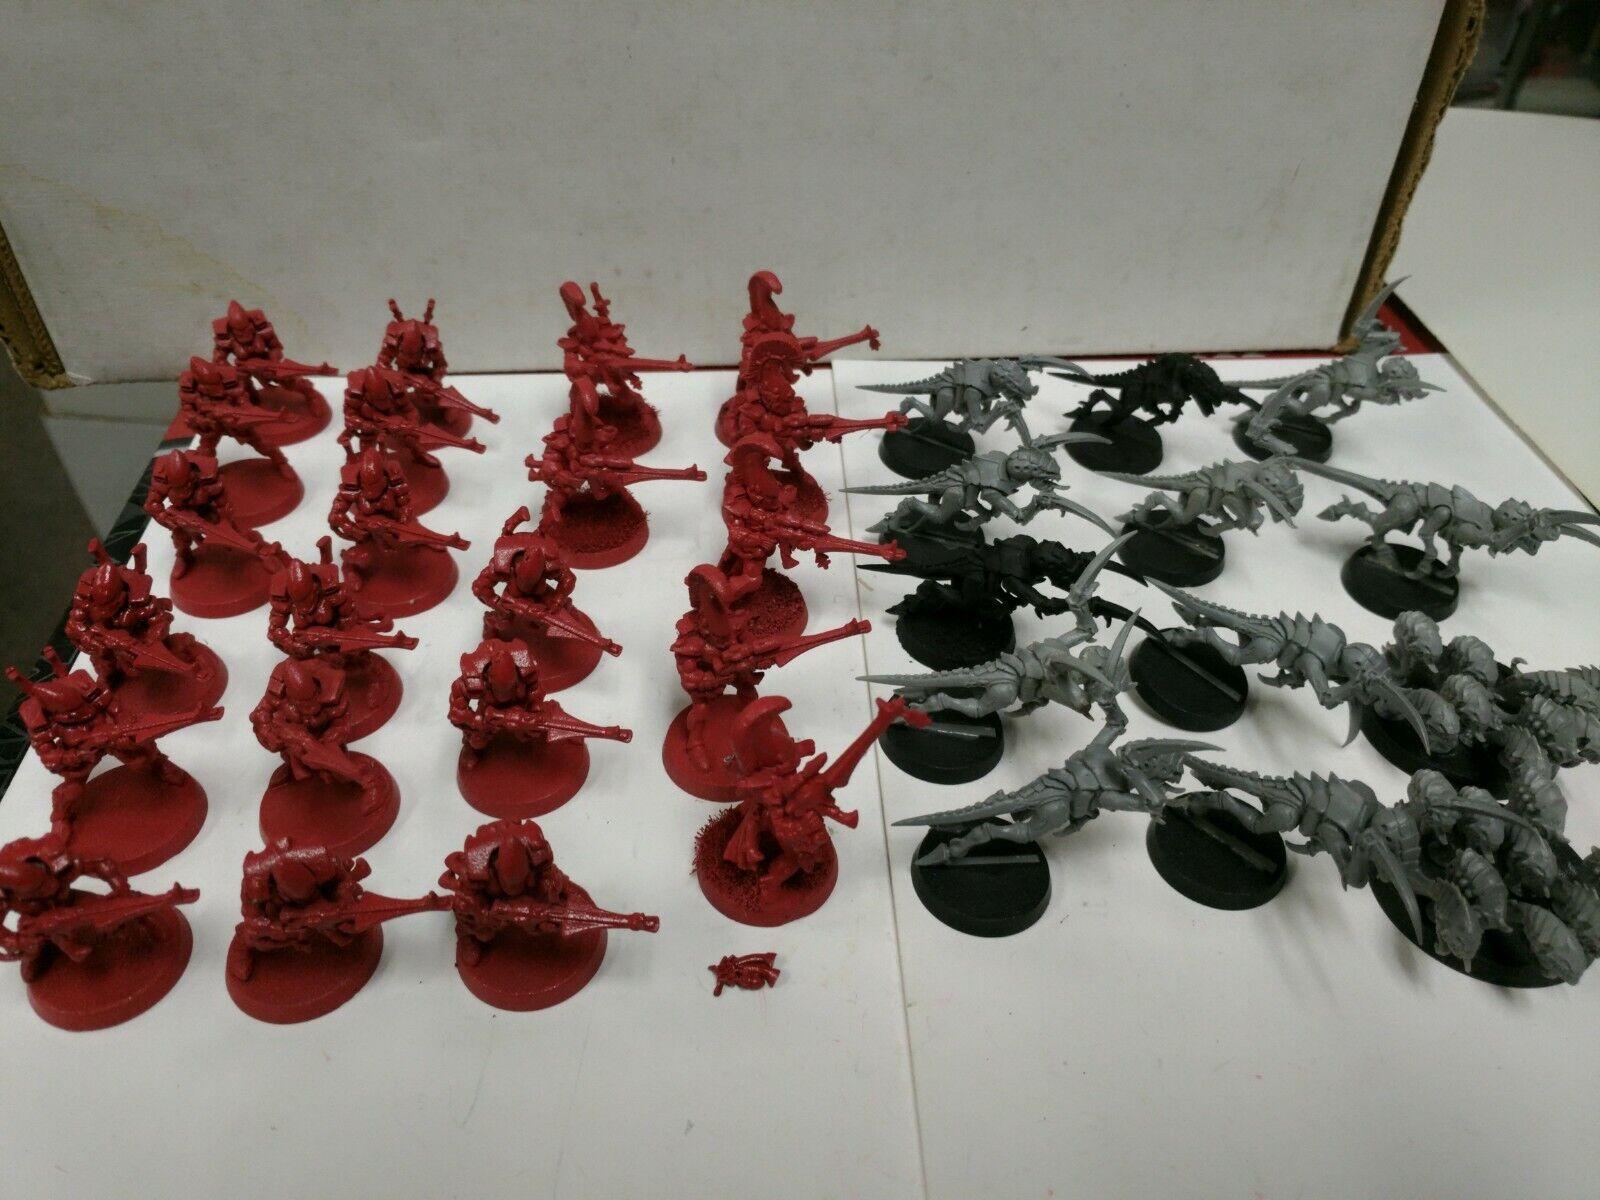 Warhammer 40k sarcófagos Eldar Guardian Reaper enjambre 34 Miniatura Figura Lote Plasti